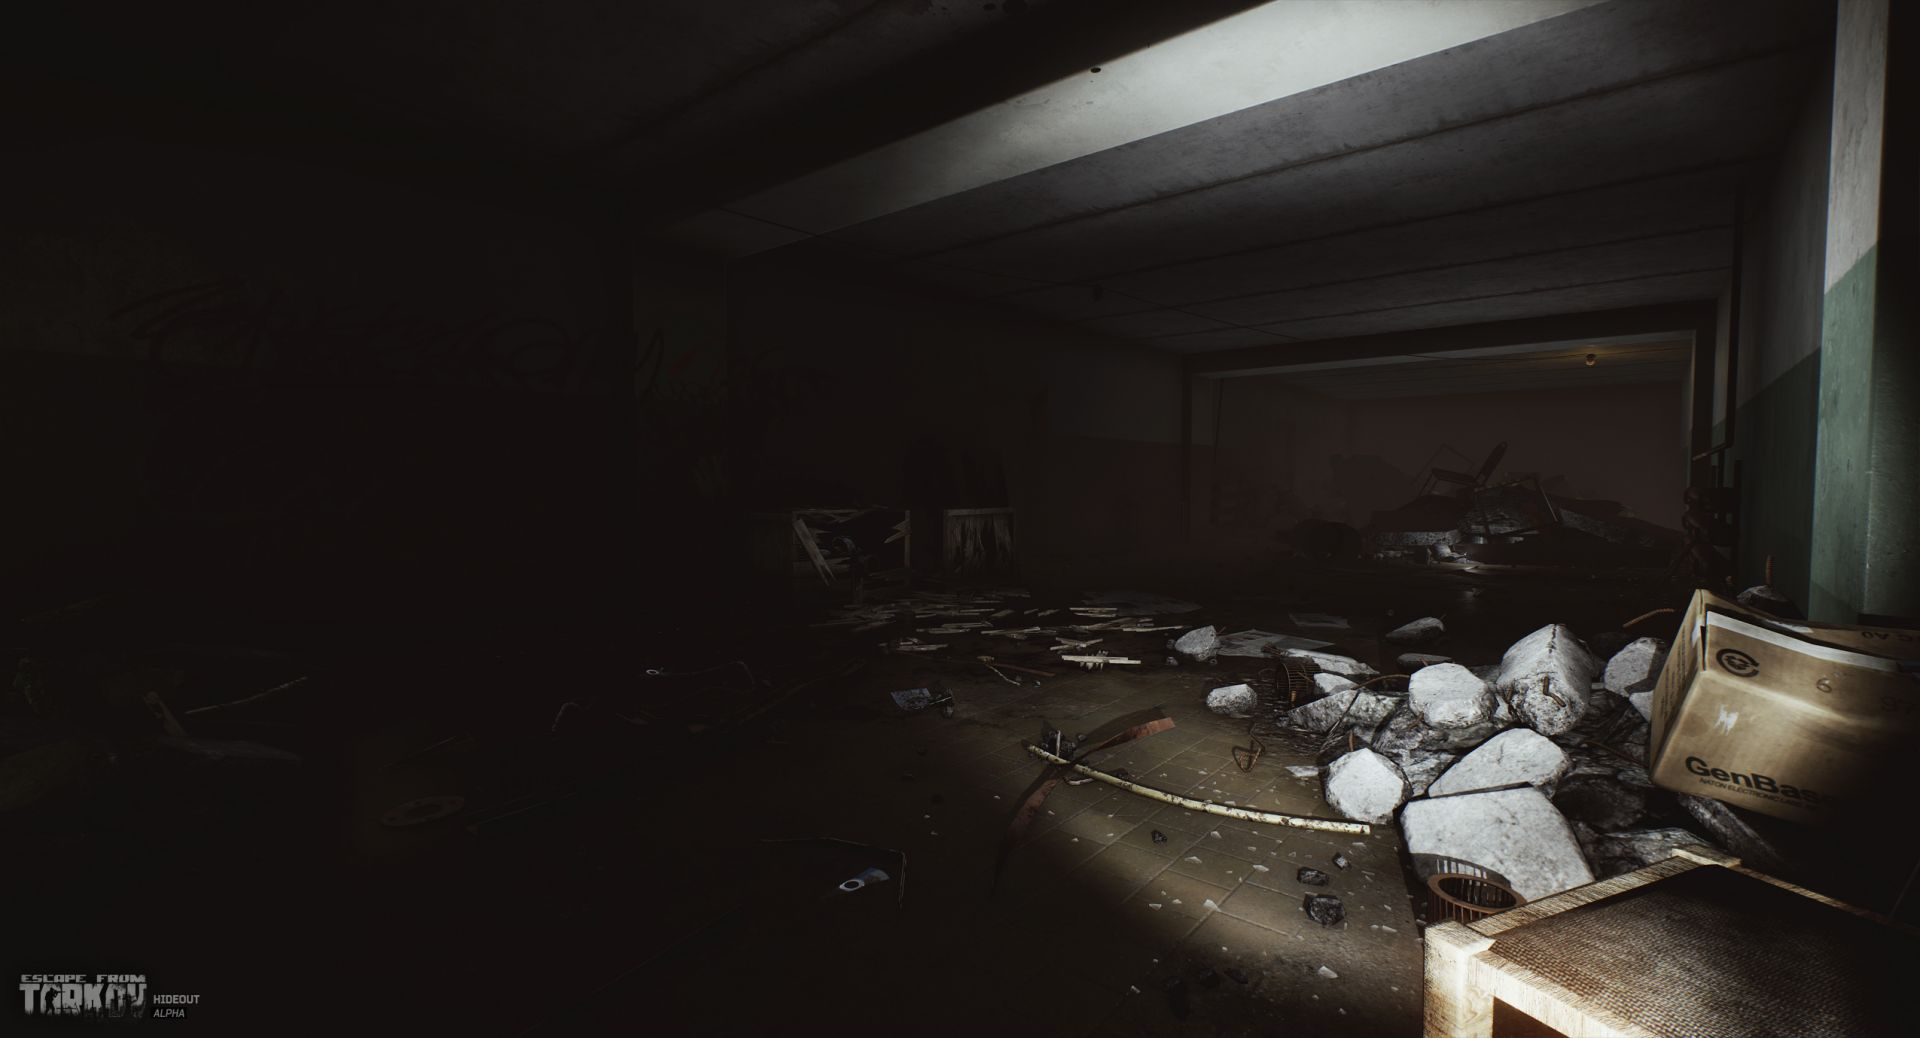 escapefromtarkov_hideout2